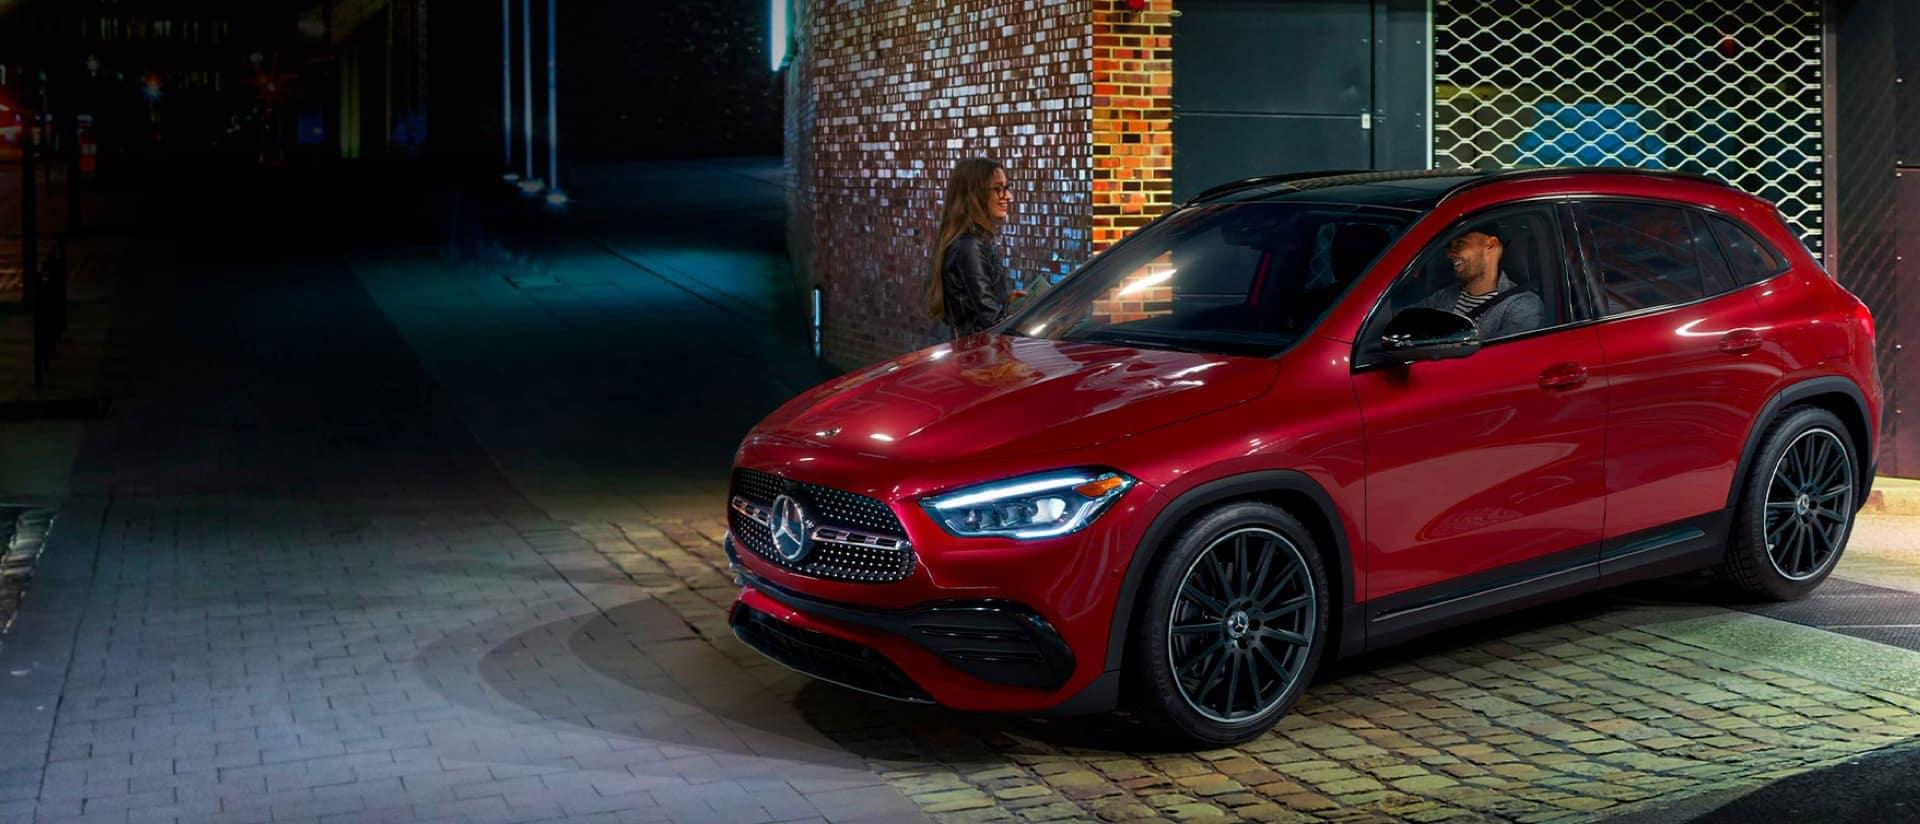 Red Mercedes-Benz SUV